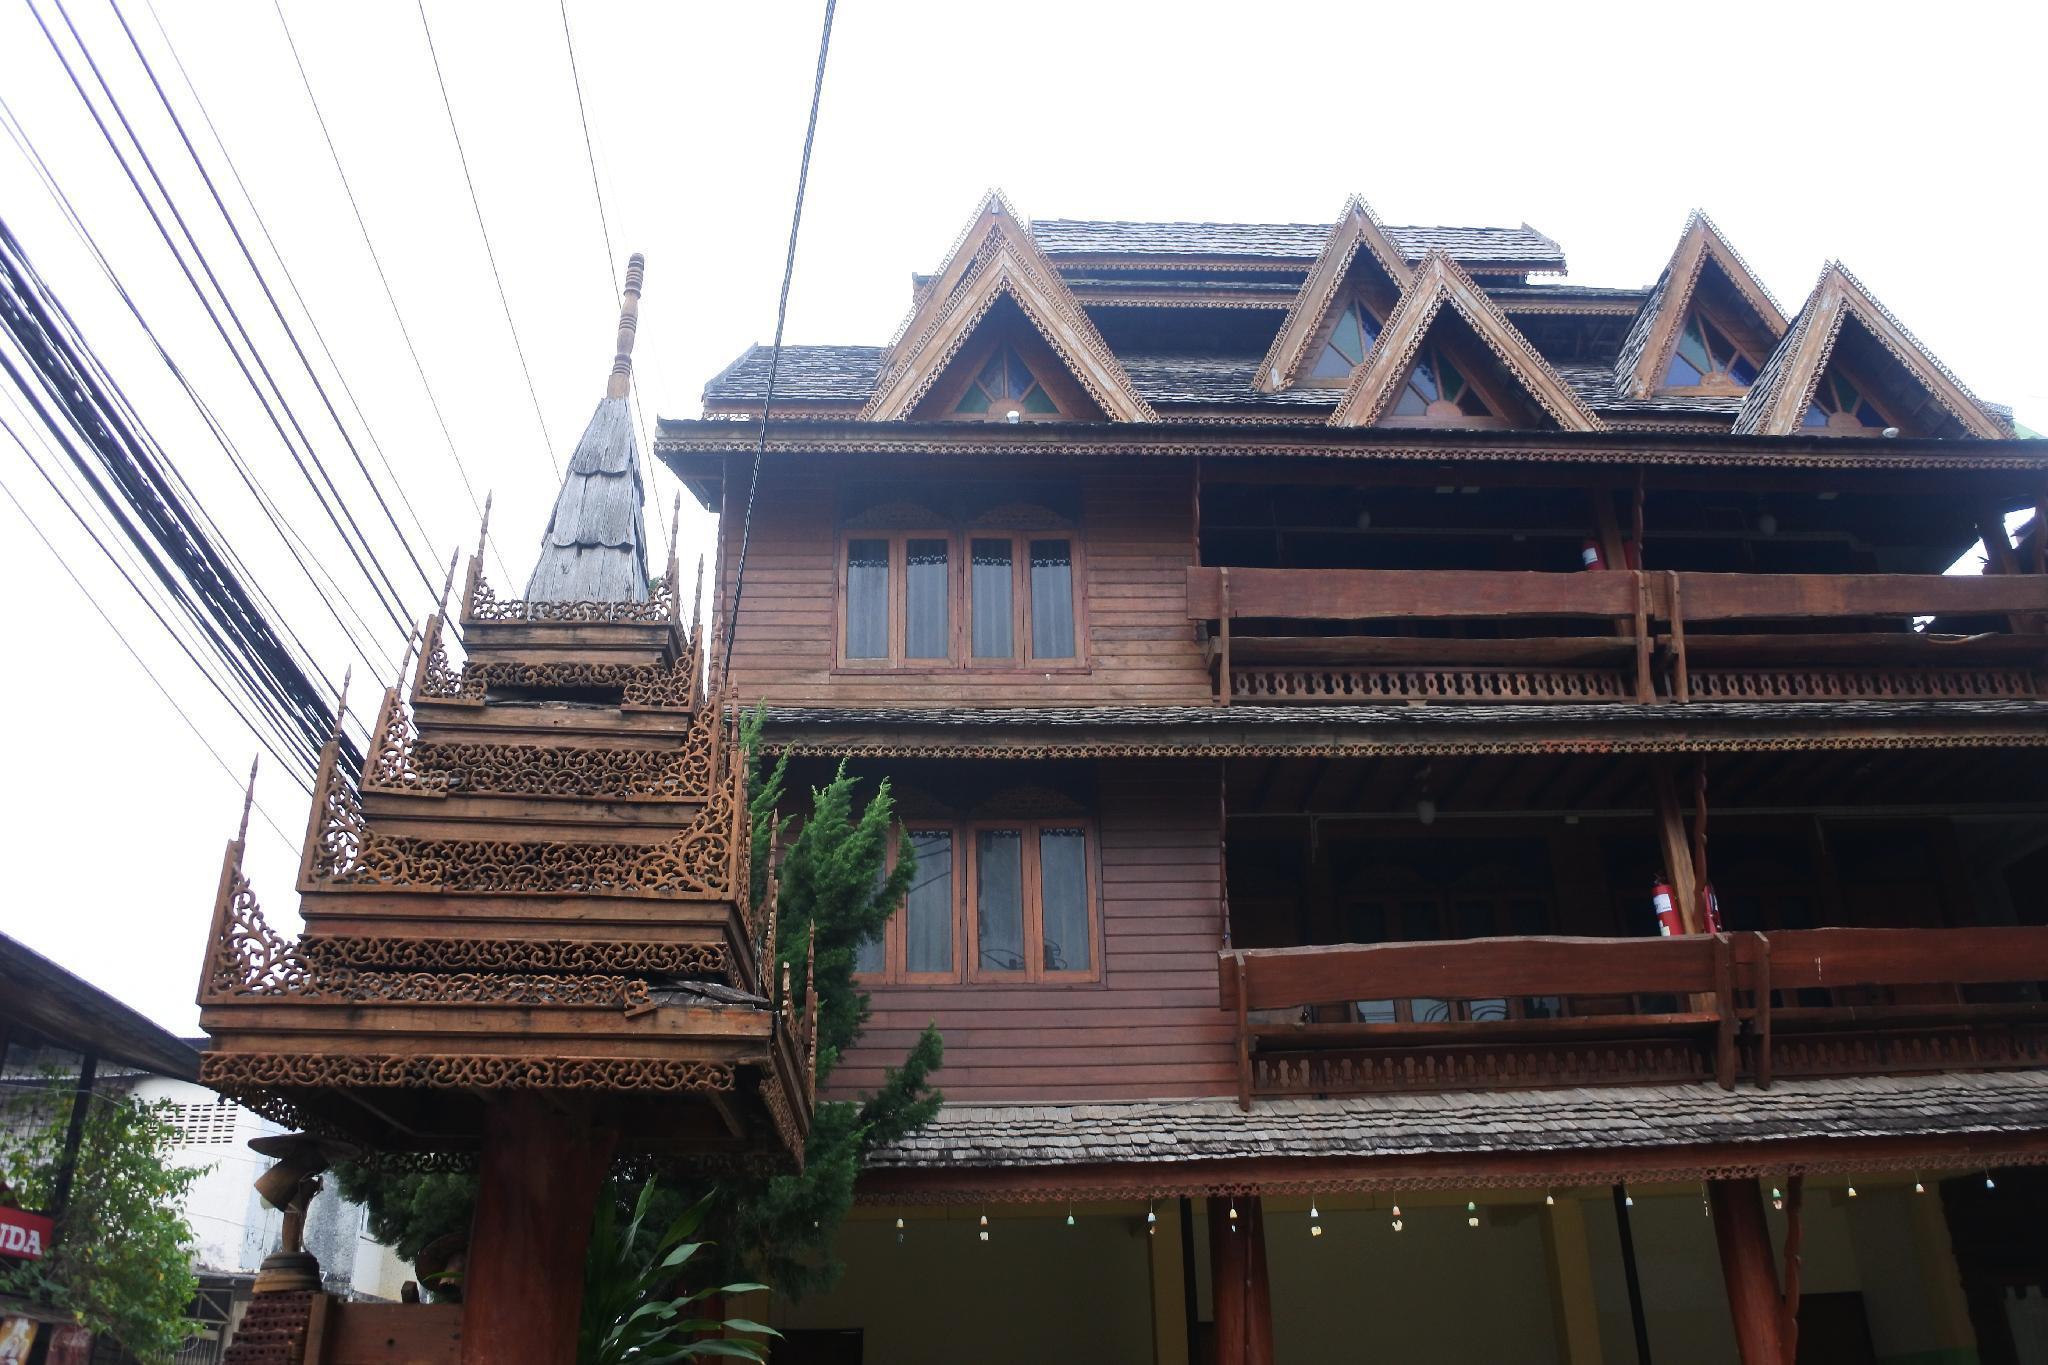 Bua khao hotel โรงแรมบัวขาว